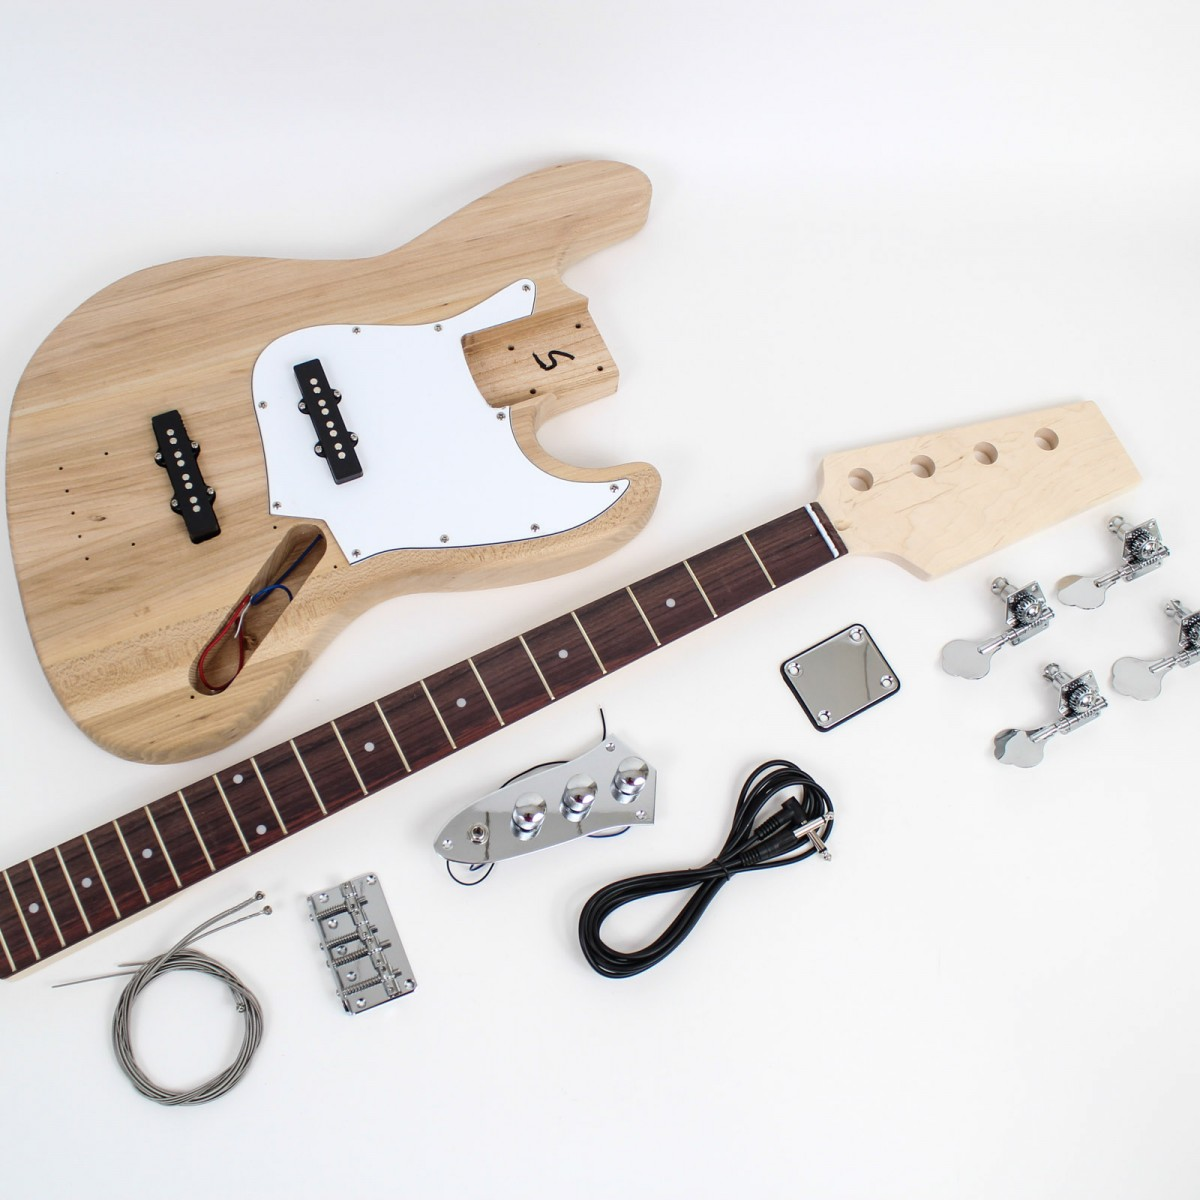 jazz bass style guitar kit lefty diy guitars. Black Bedroom Furniture Sets. Home Design Ideas